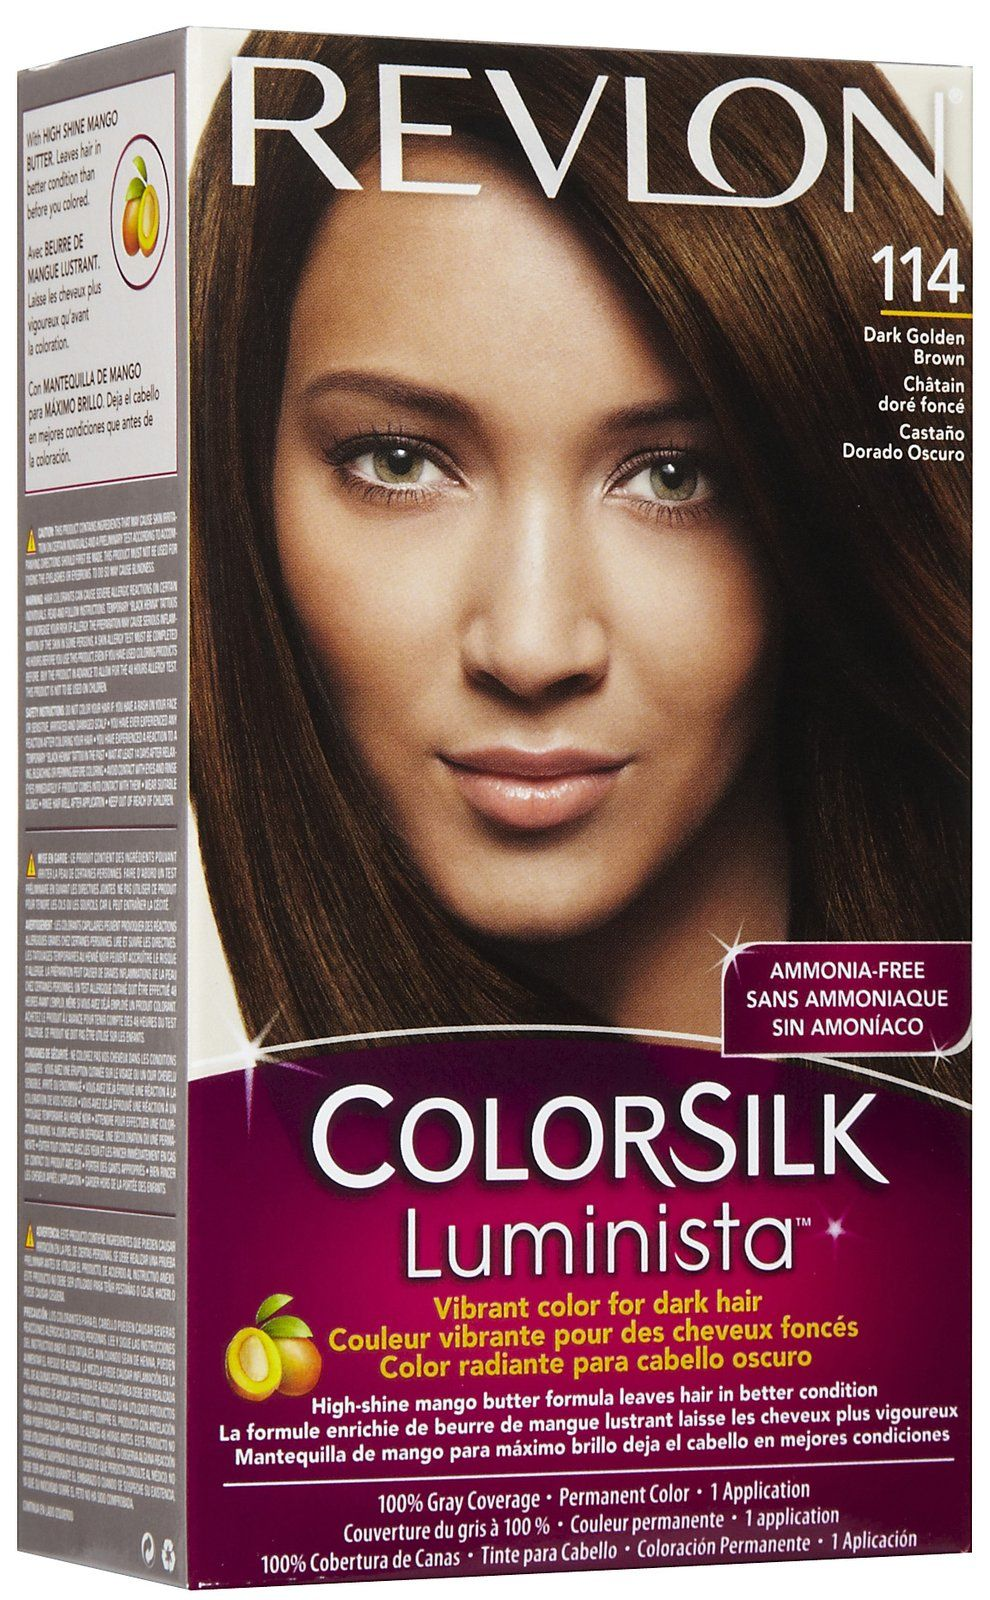 Revlon Colorsilk Luminista Permanent Hair Color Light Golden Brown